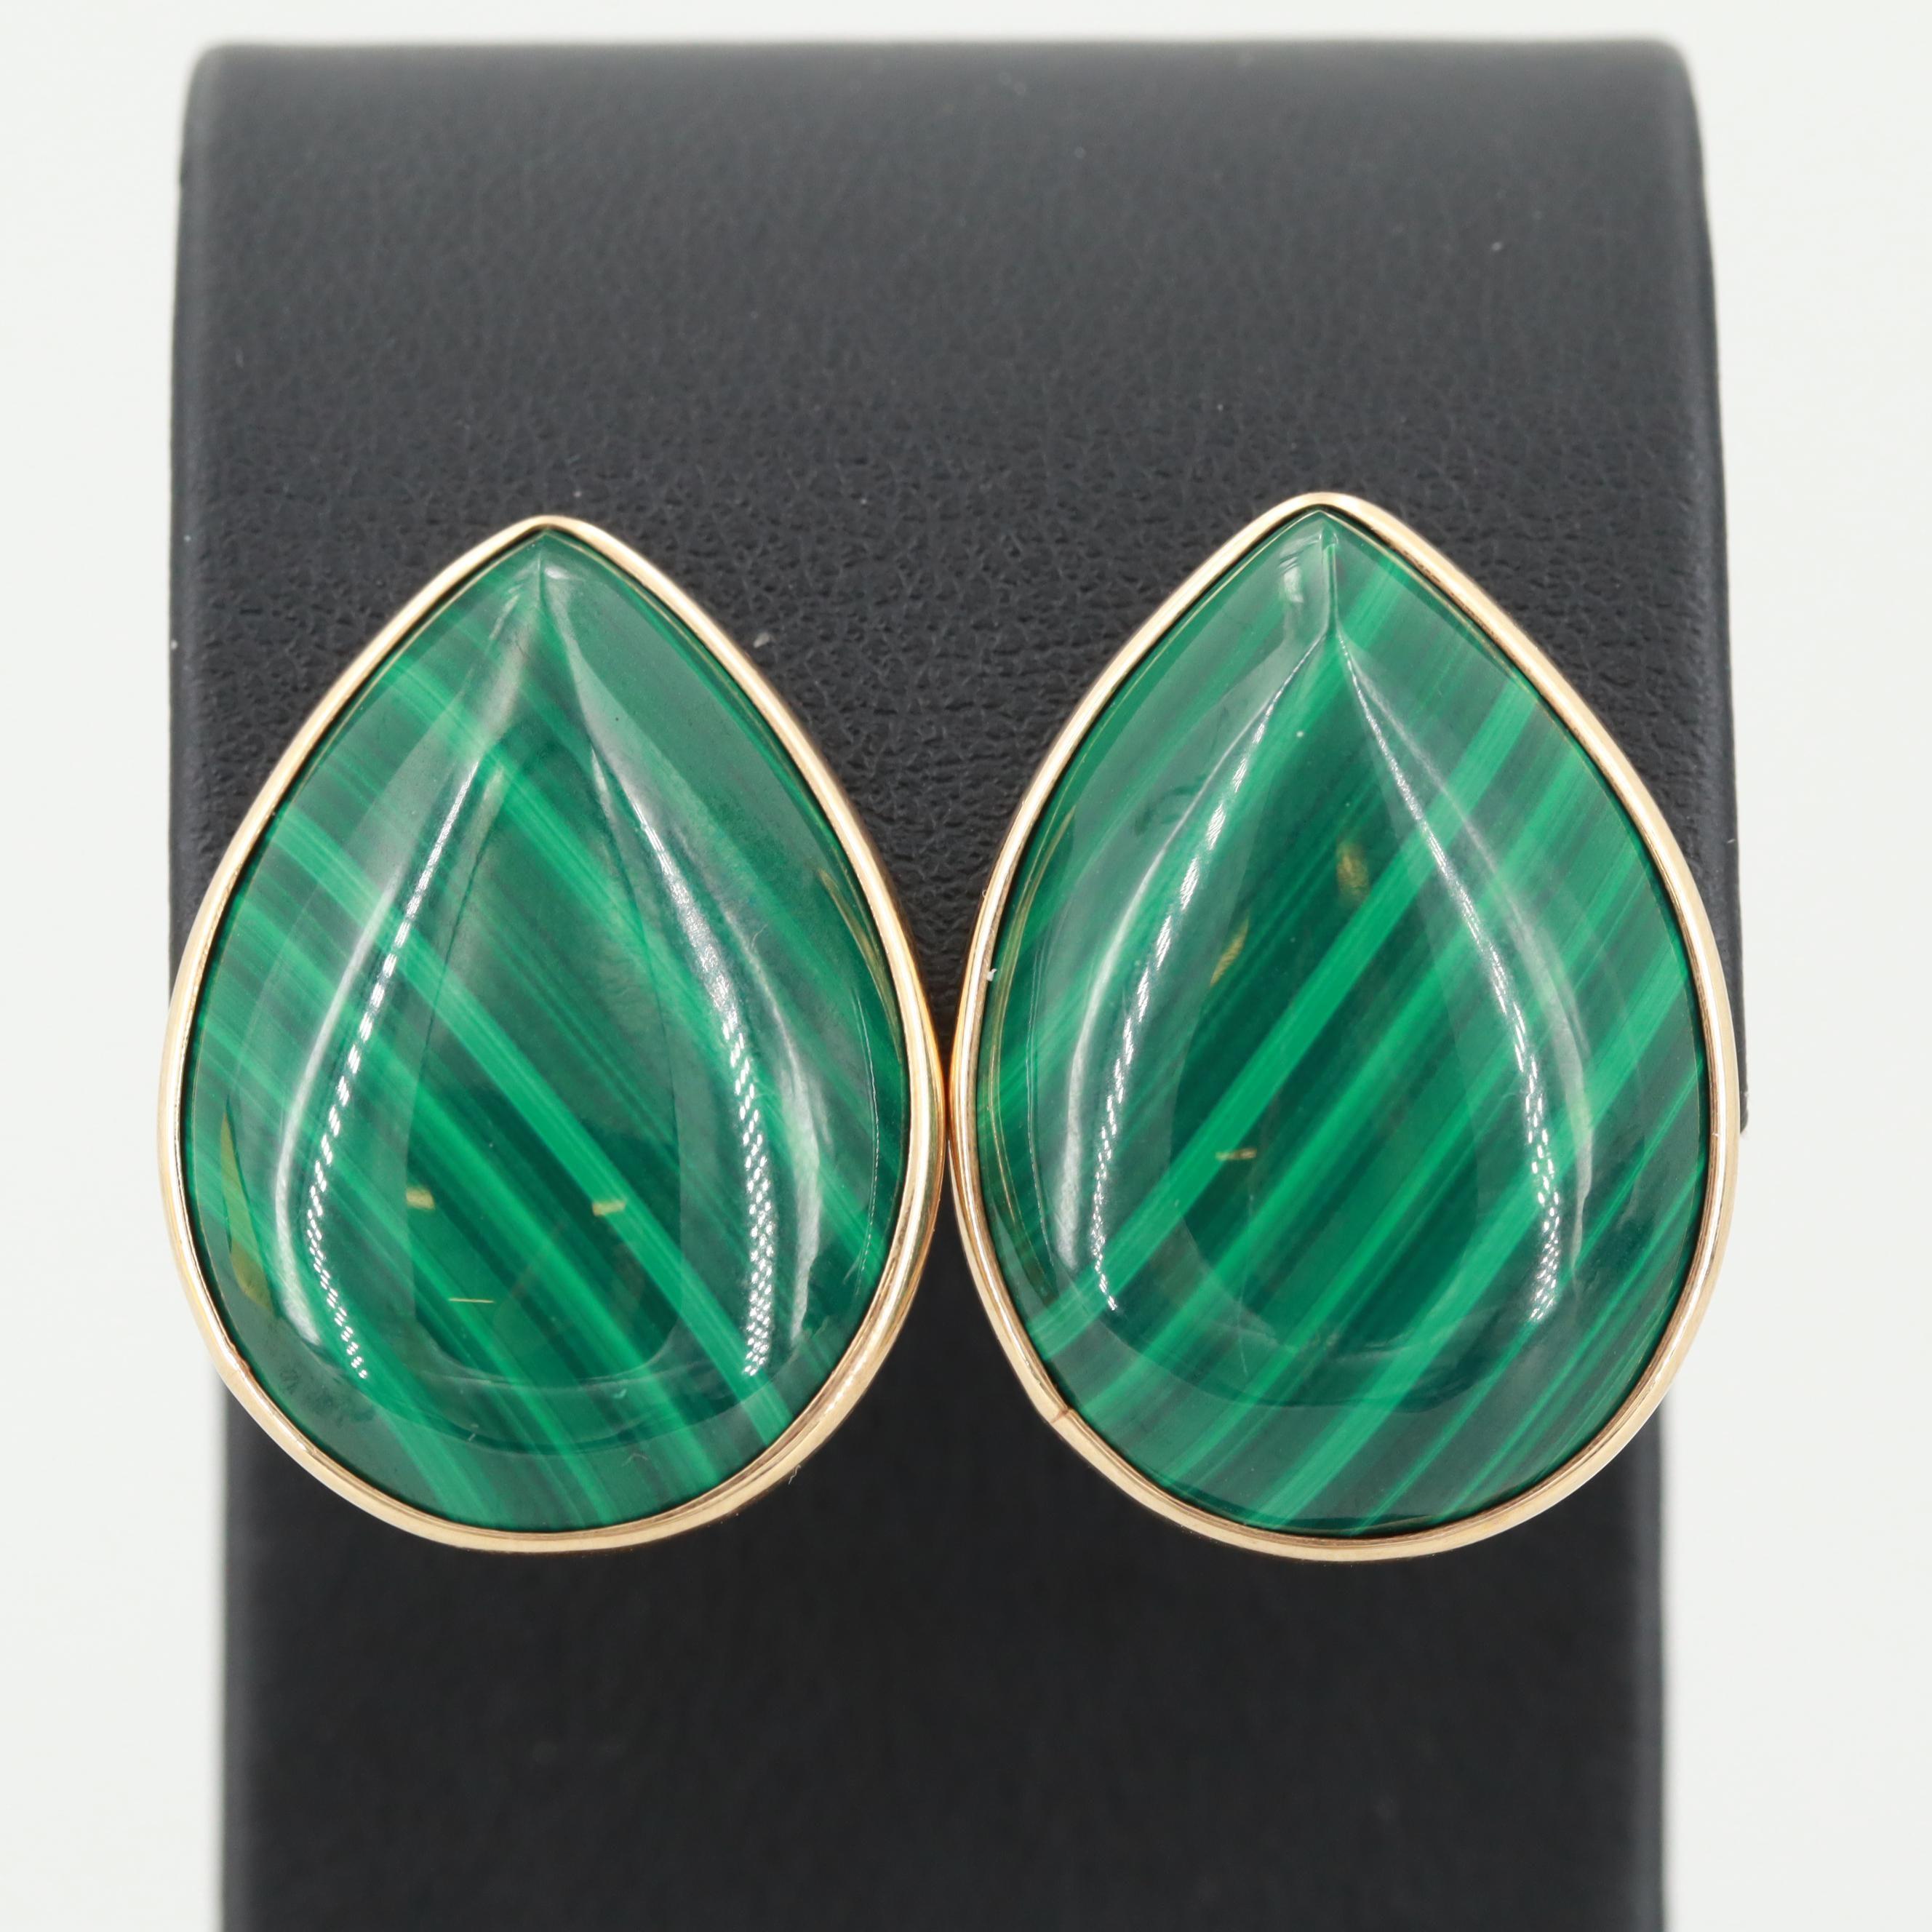 14K Yellow Gold Malachite Cabochon Earrings